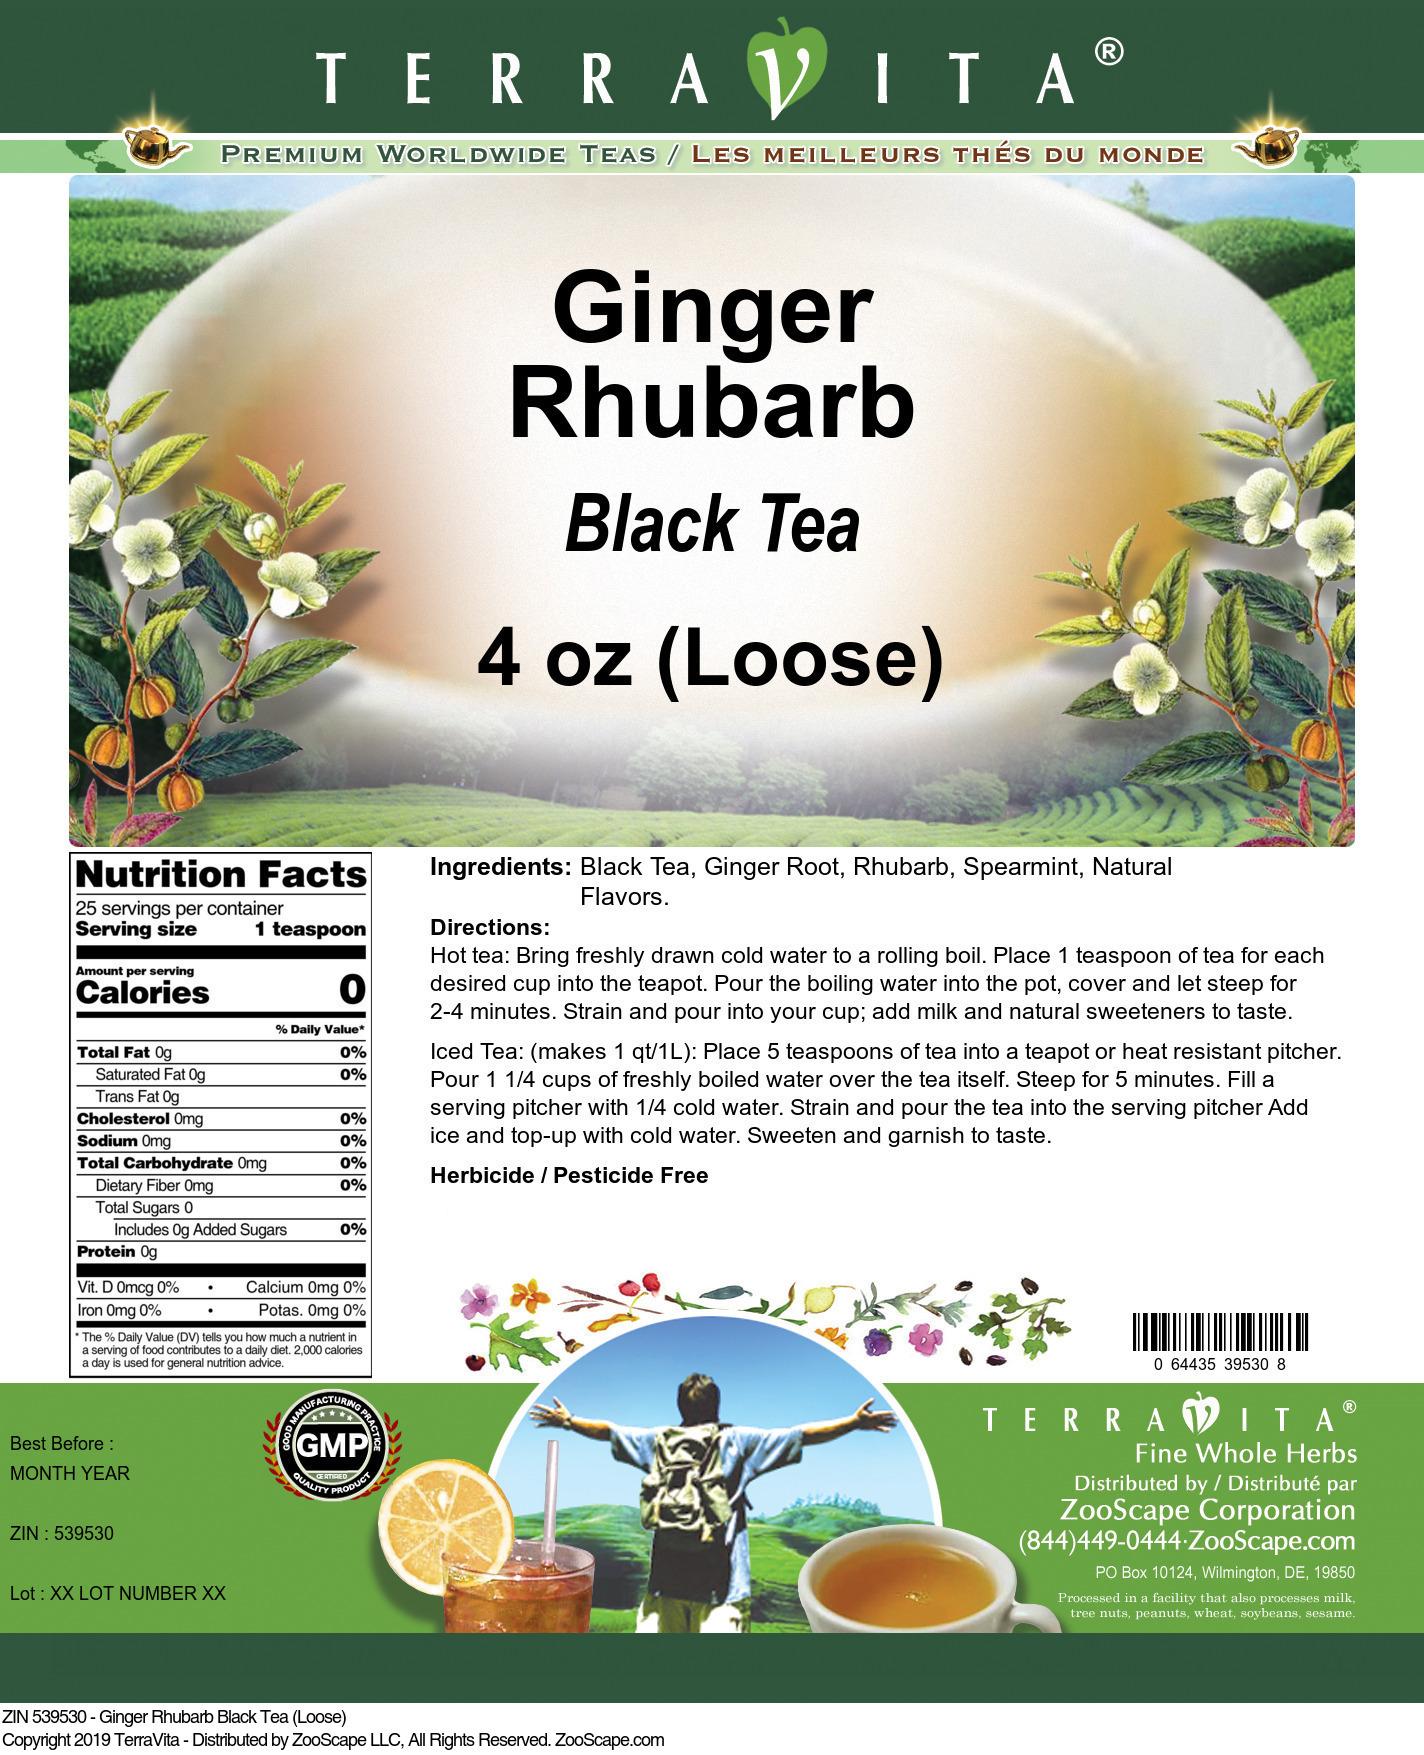 Ginger Rhubarb Black Tea